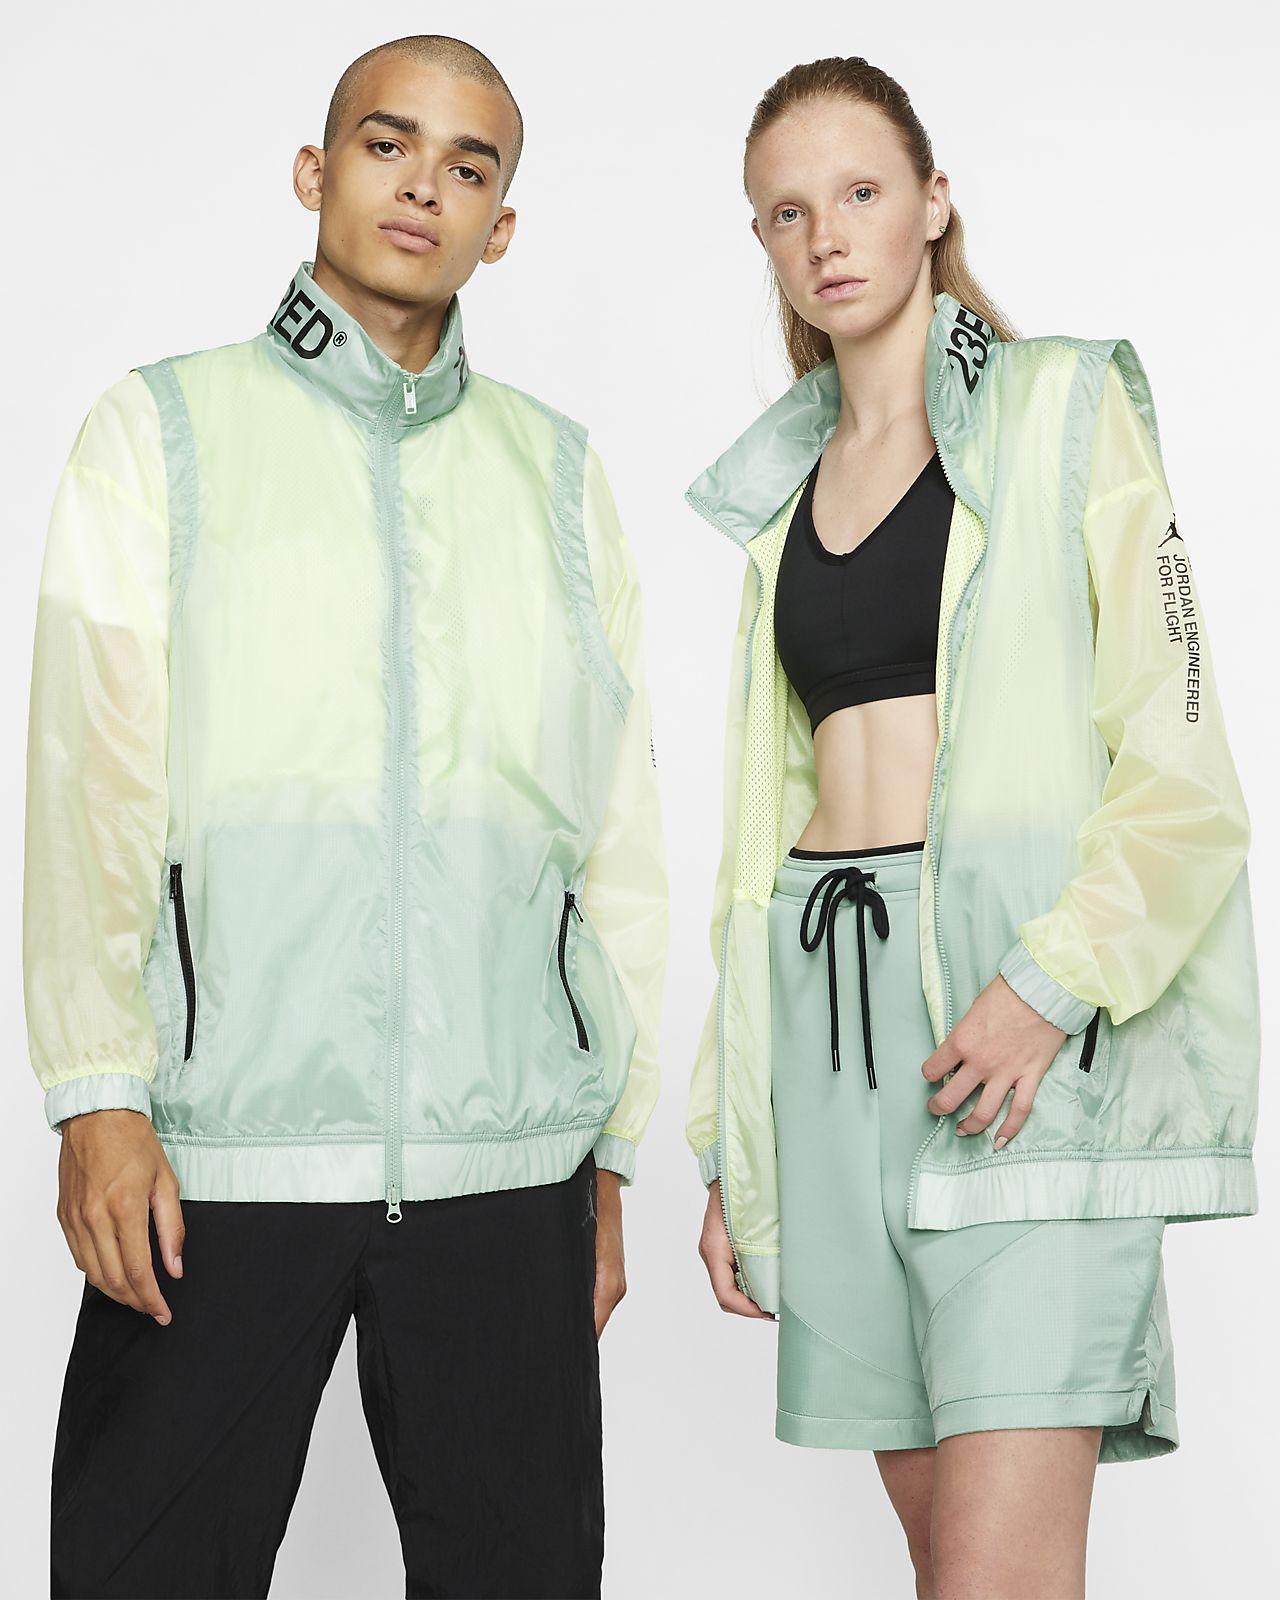 Jordan 23 Engineered-jakke med lynlås